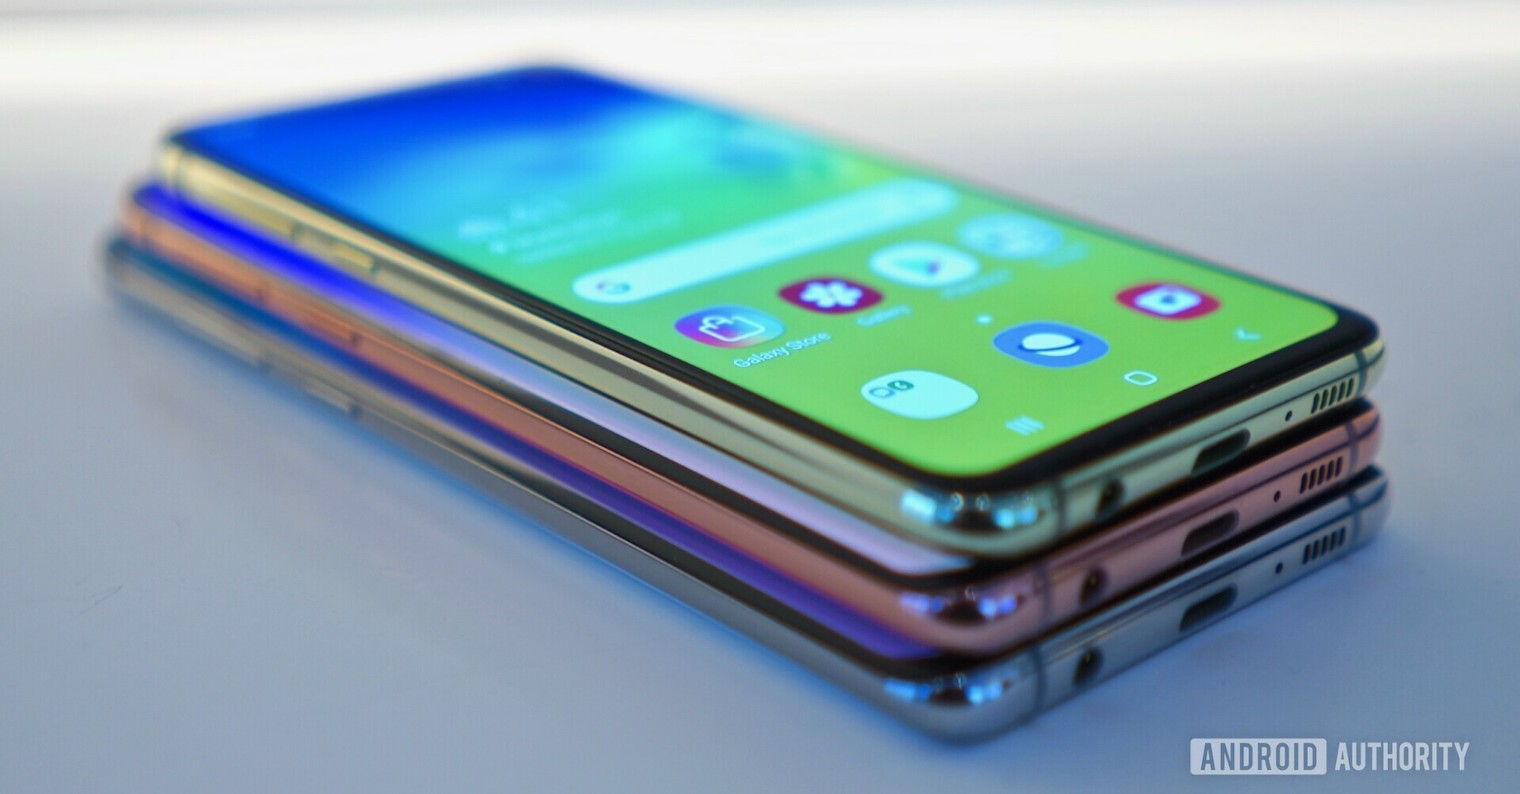 Samsung Galaxy S10 family